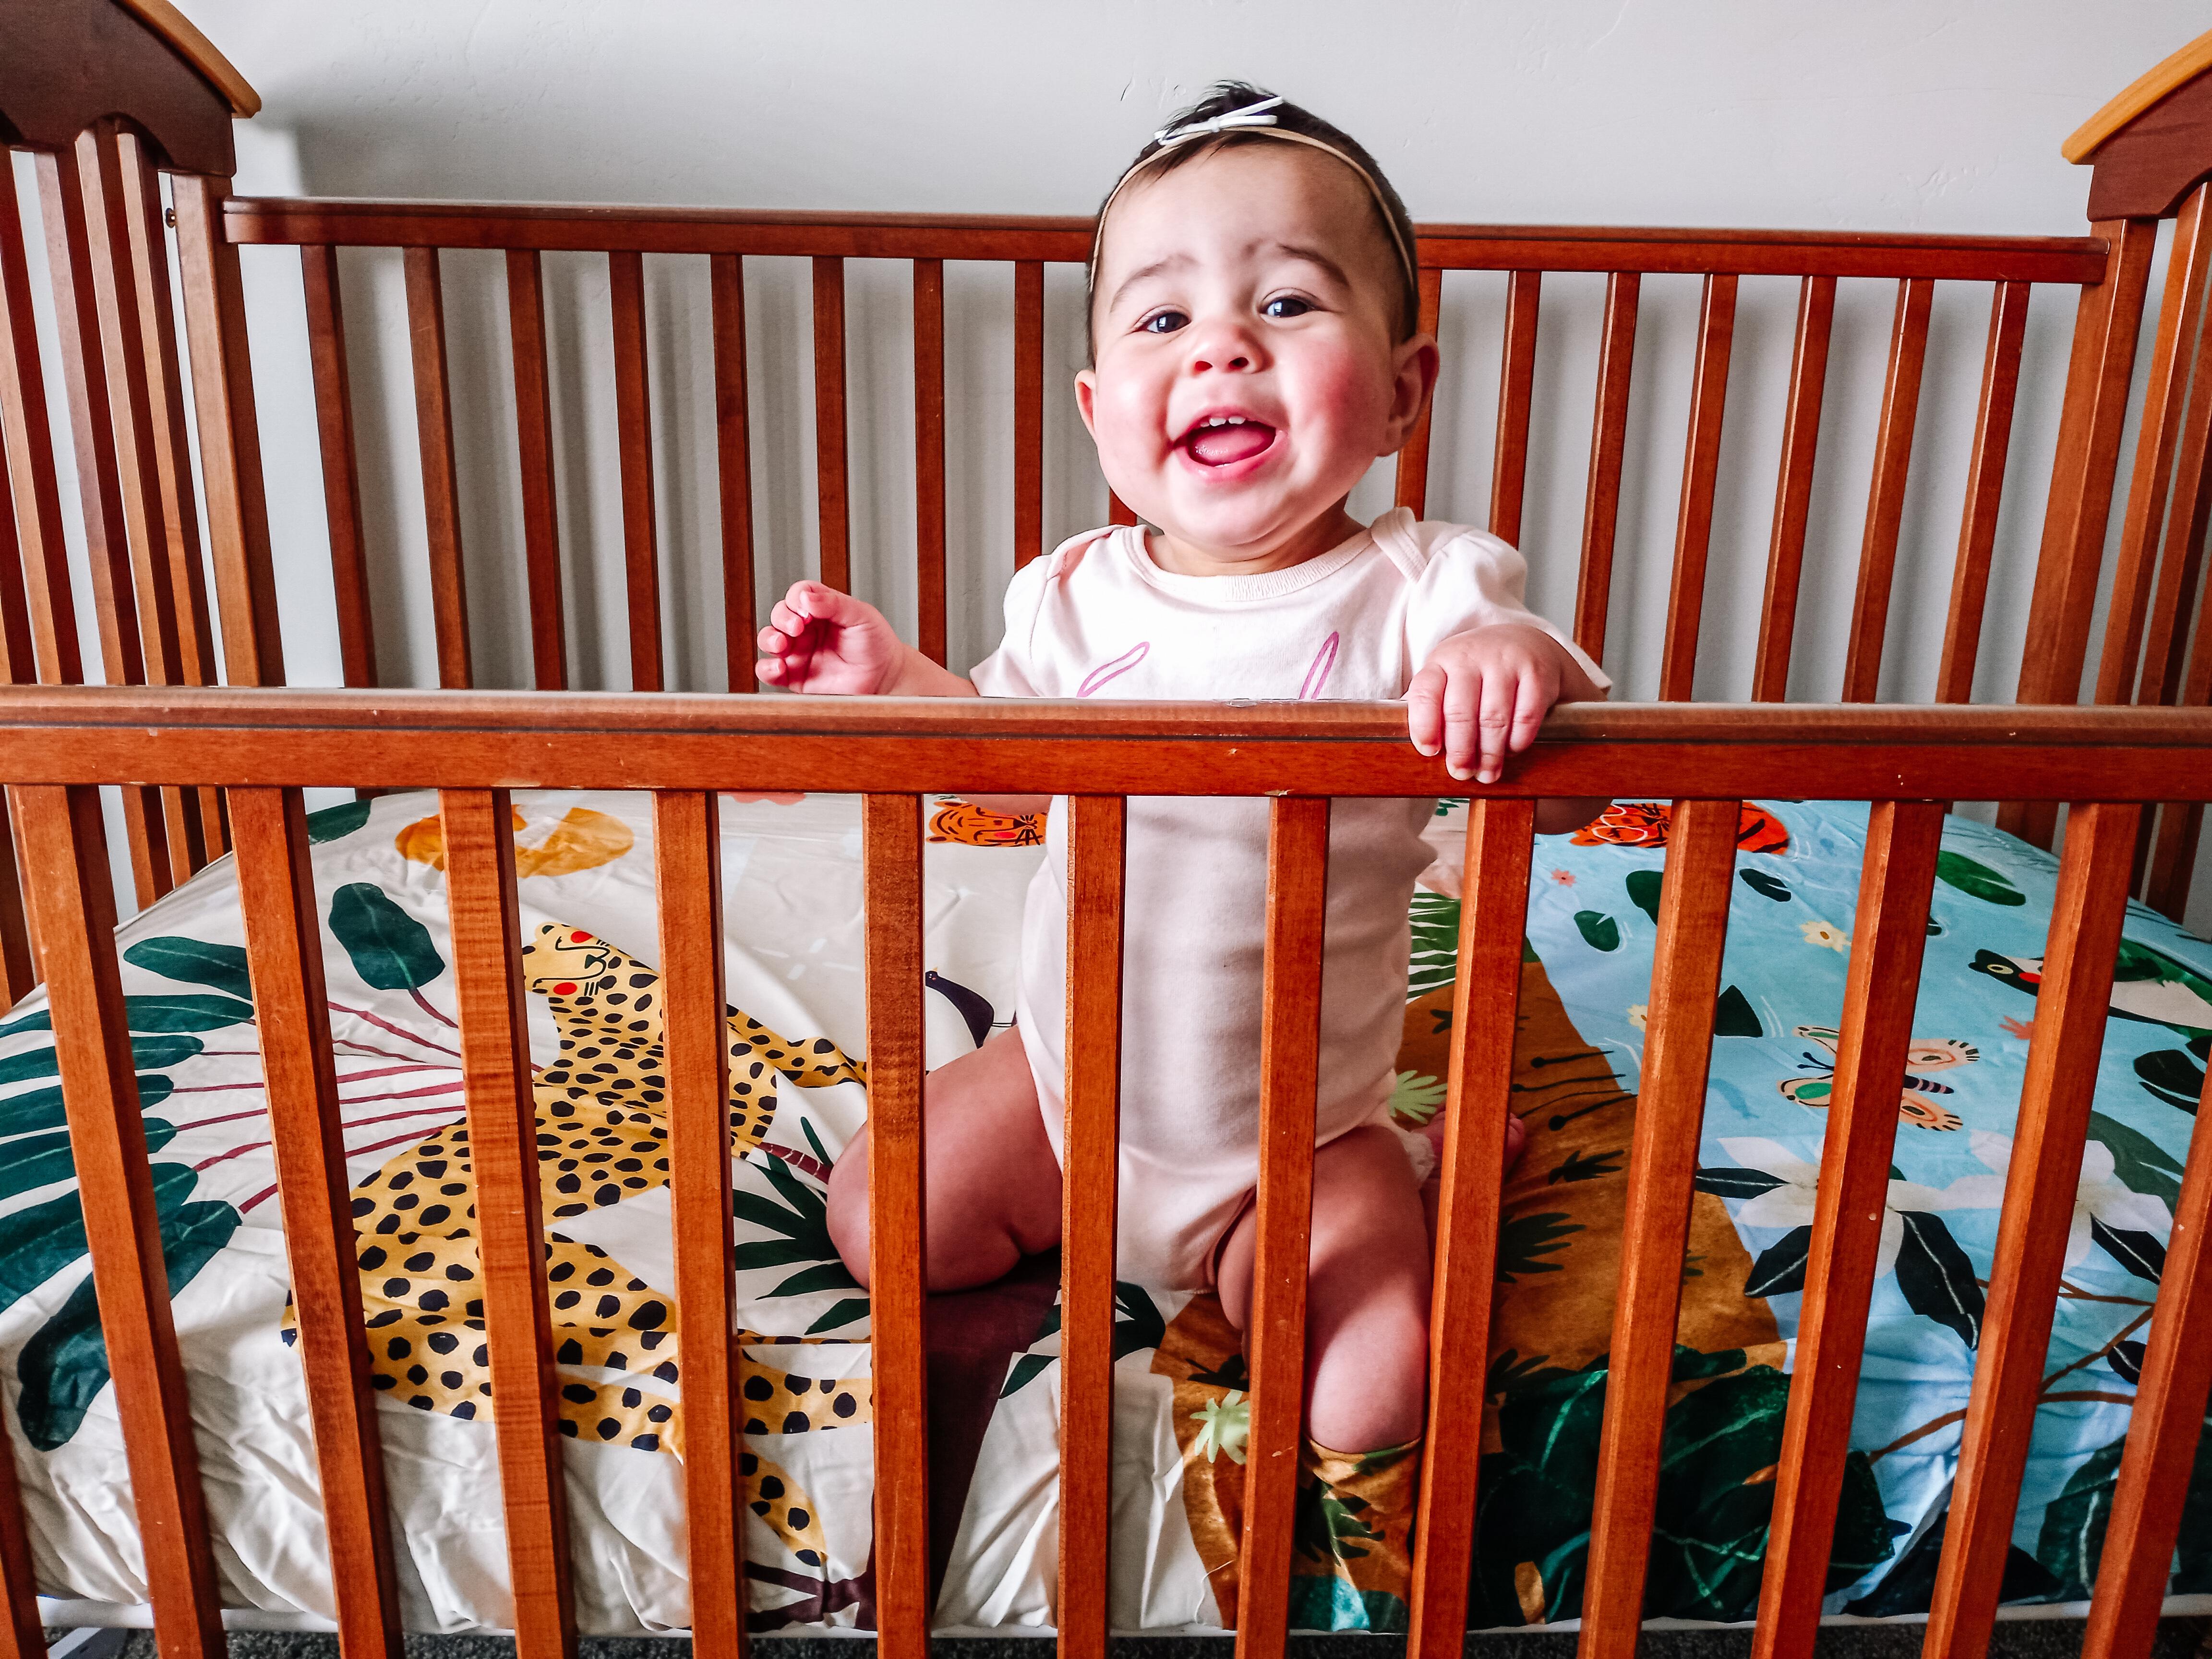 Jungle nursery decor for baby